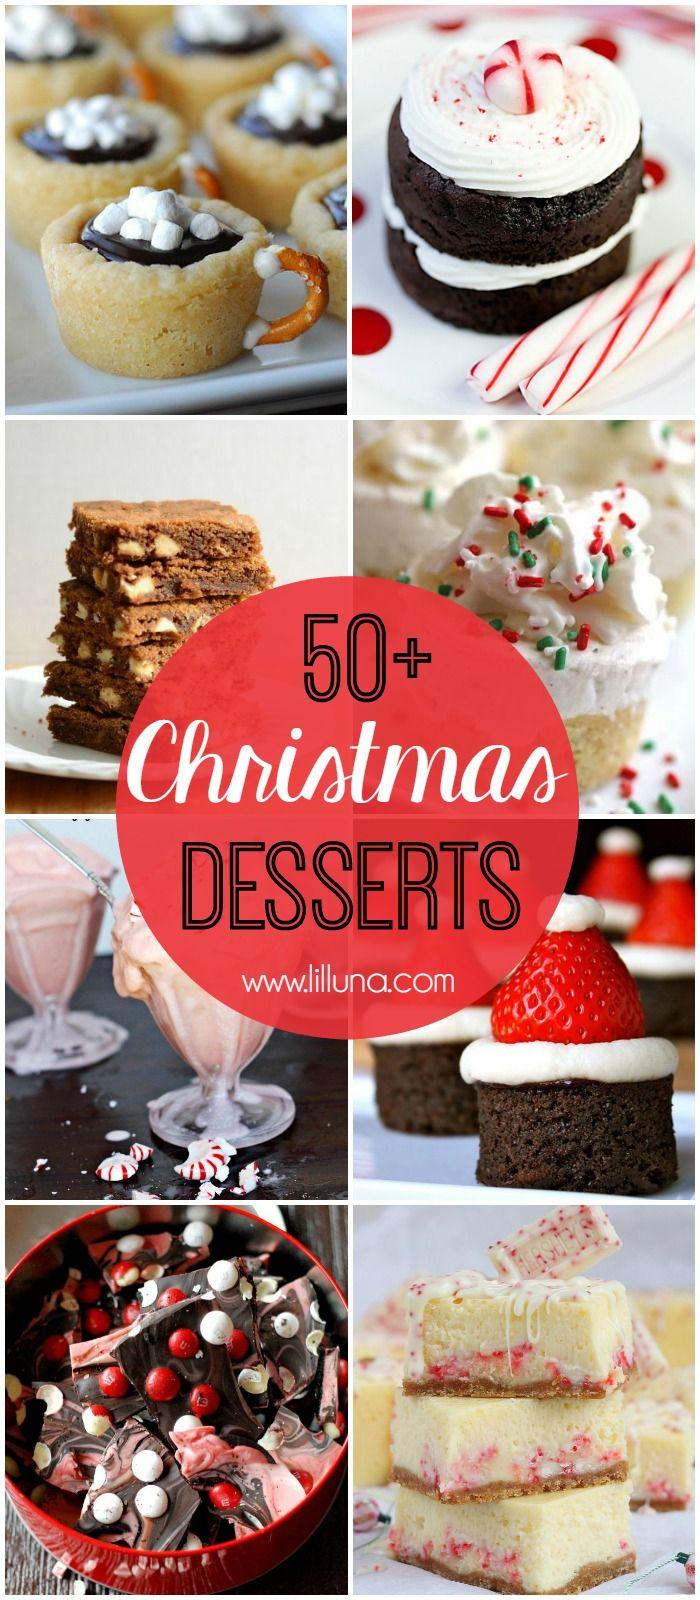 50+ Christmas Desserts!